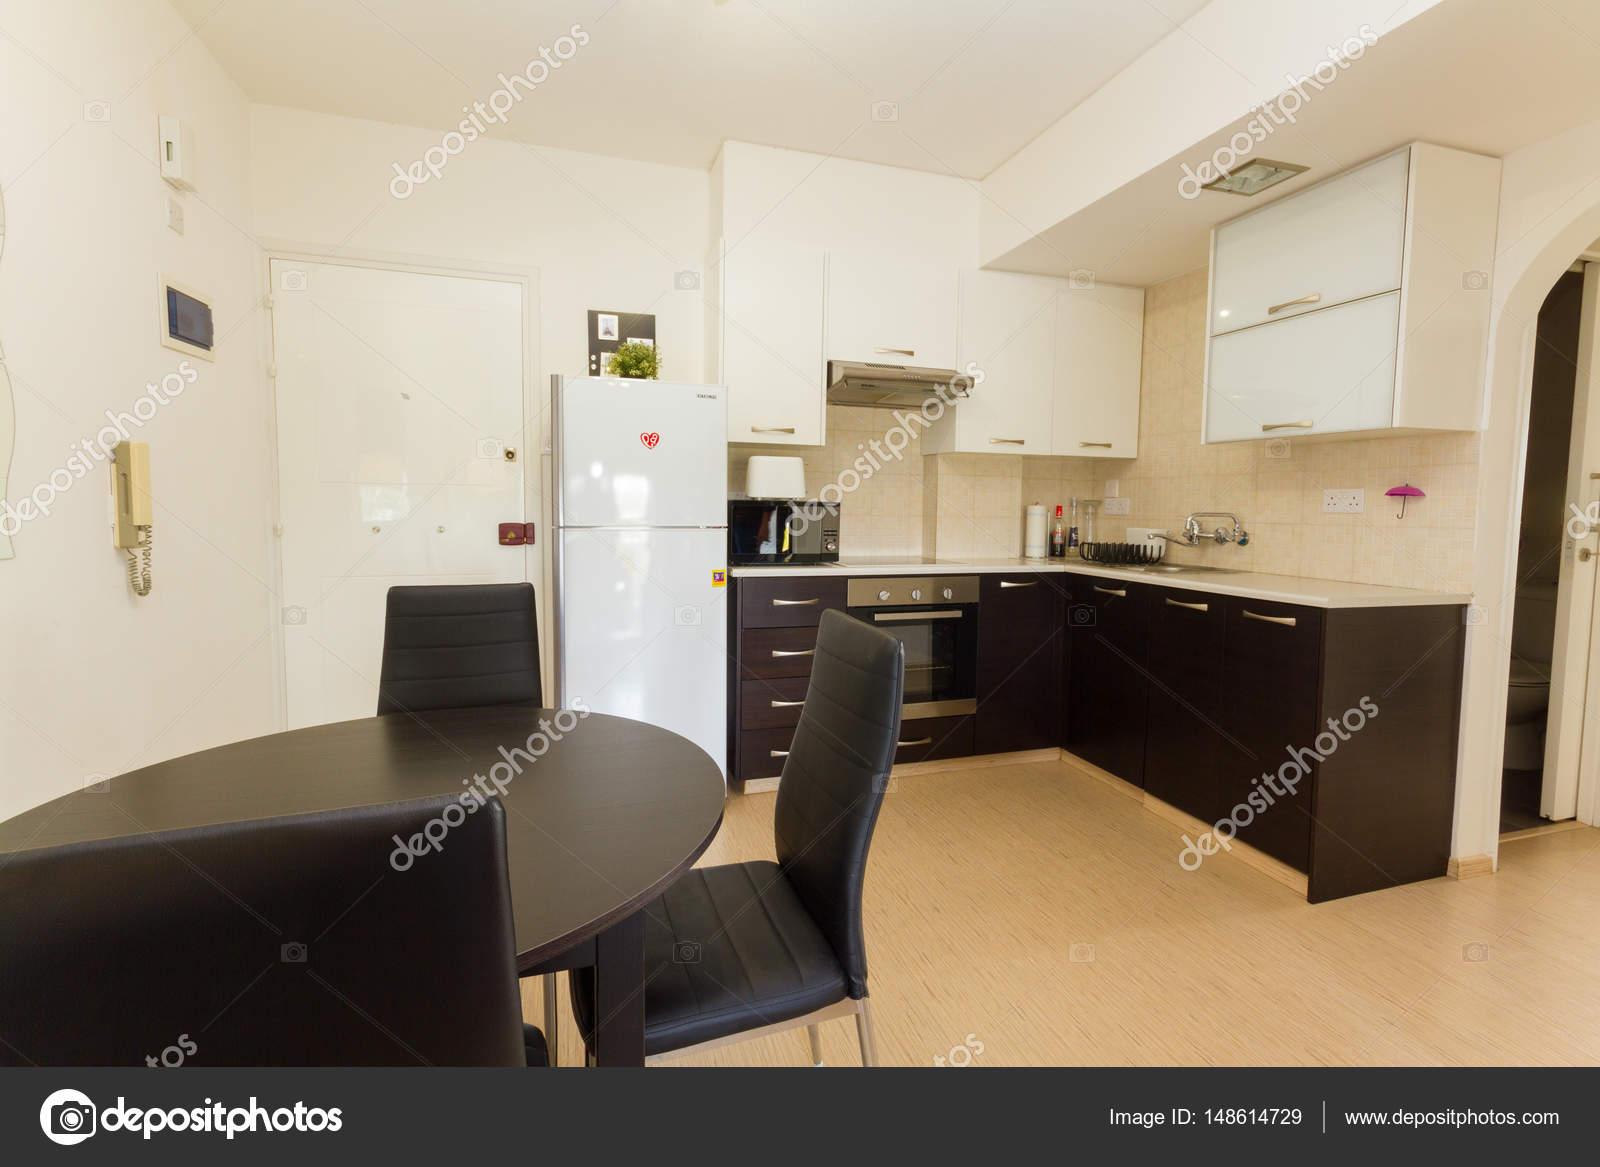 Moderne keuken in wenge en witte kleuren u stockfoto palliki